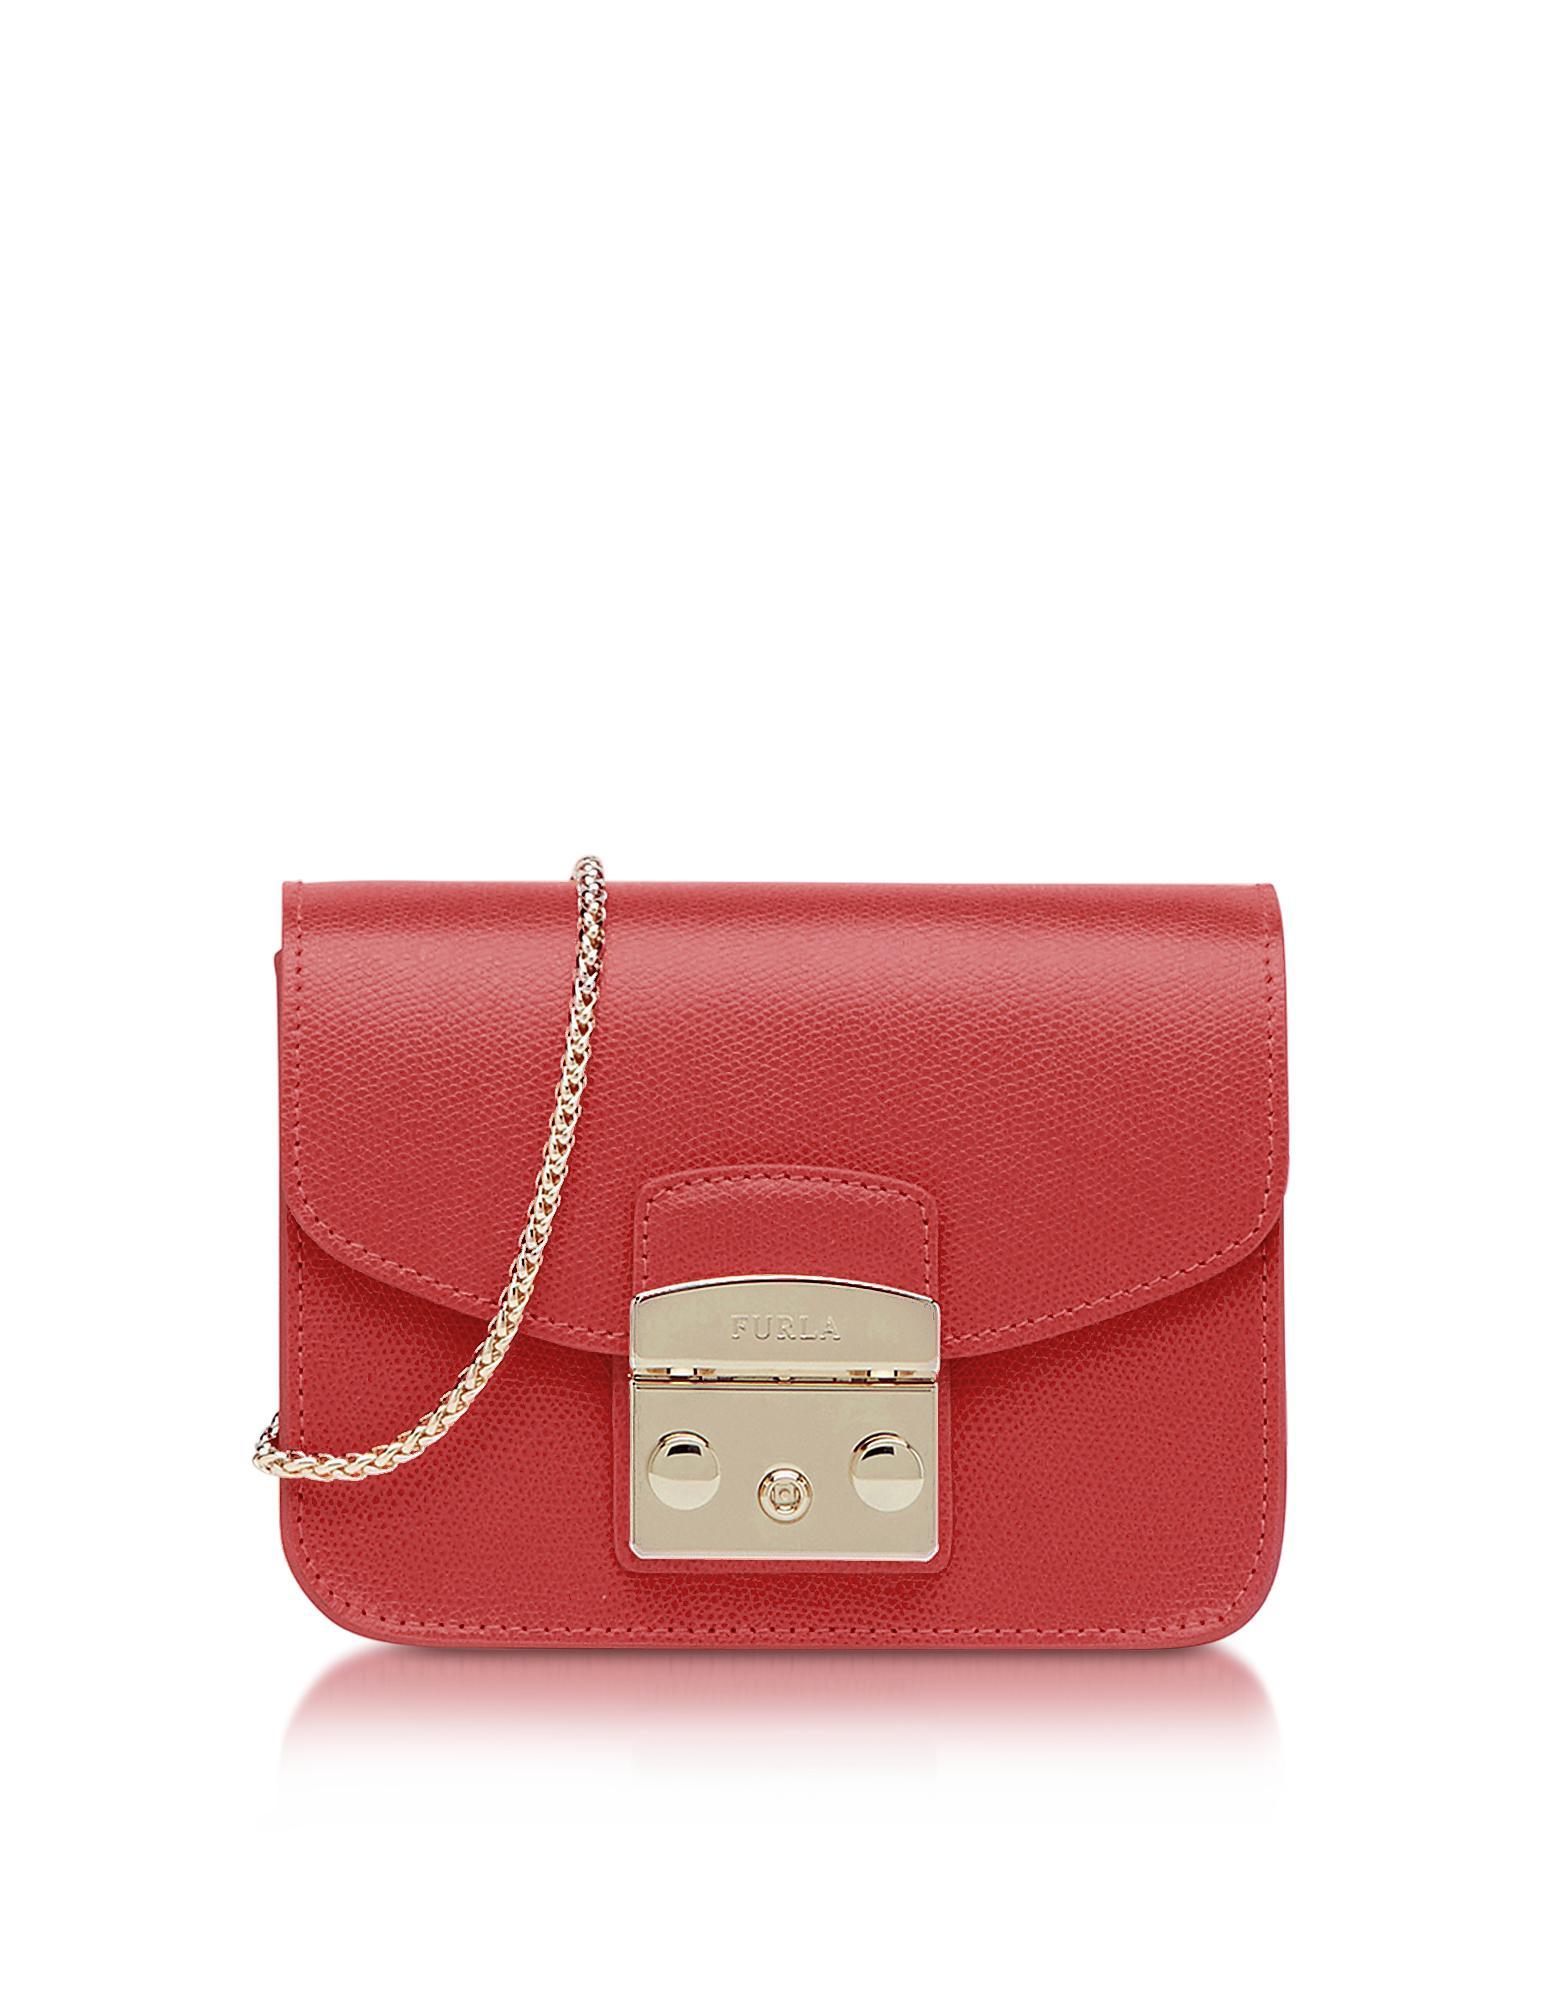 6816a3cfd Furla - Red Ruby Leather Metropolis Mini Crossbody Bag - Lyst. View  fullscreen